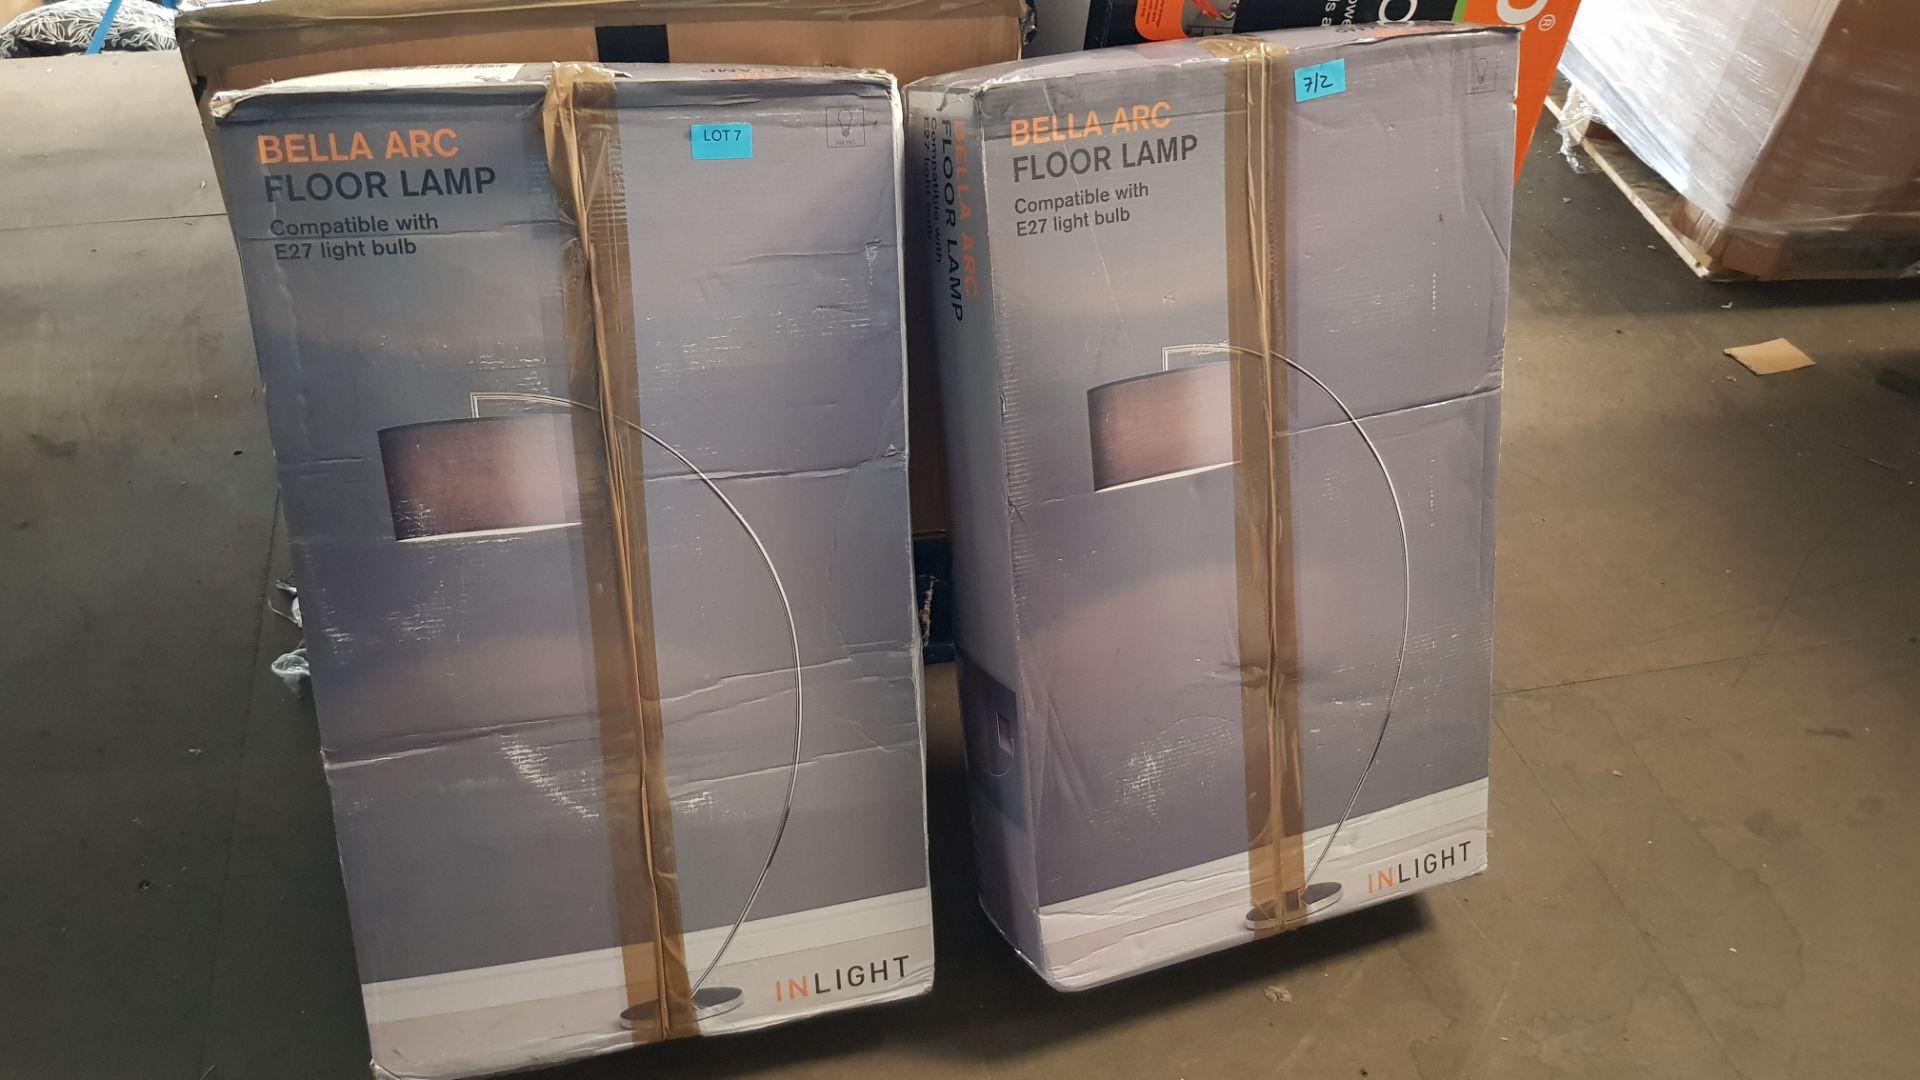 (P8) 2x In Light Bella Arc Floor Lamp RRP £69 Each. - Image 3 of 3